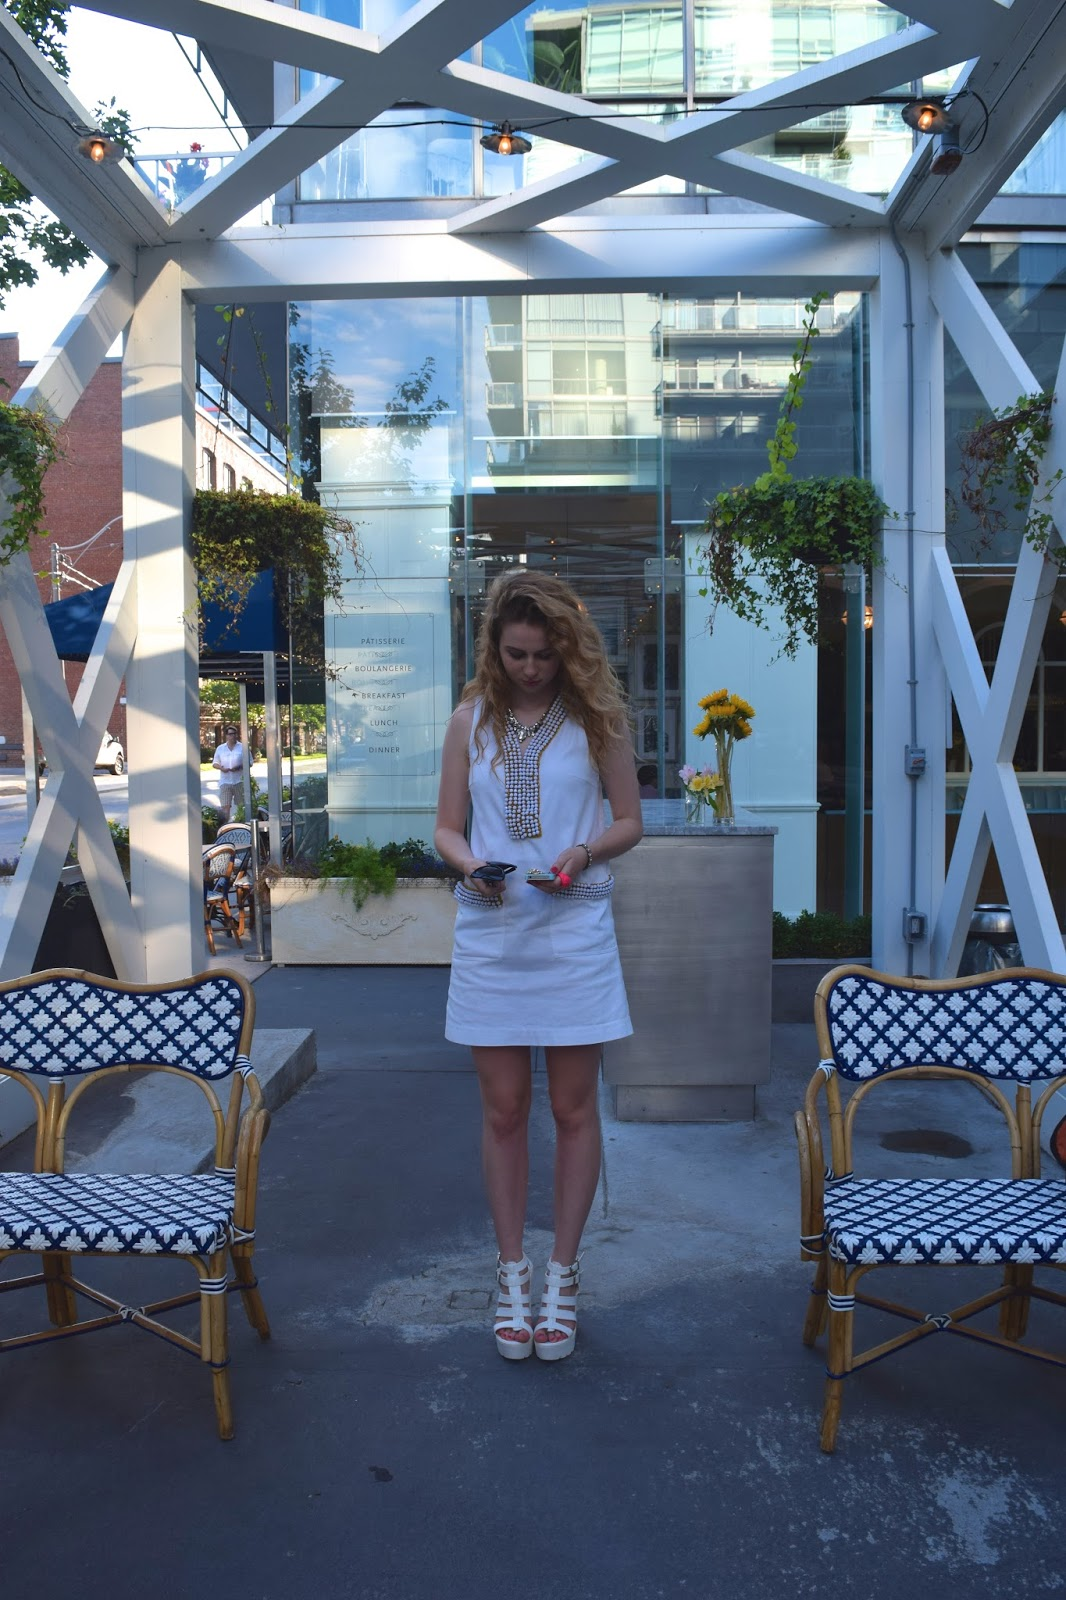 Paris Fashion, Manoush, Manoush Dress, Fashion & Beauty Inc, FABINCBLOG, Annie Robinson, Annie Robinson Street Style, Annie Robinson Blog, Toronto Blogger, Toronto Street Style, Russian Blogger, Russian Street Style, Russian Fashion, Collette Toronto, Thompson Toronto